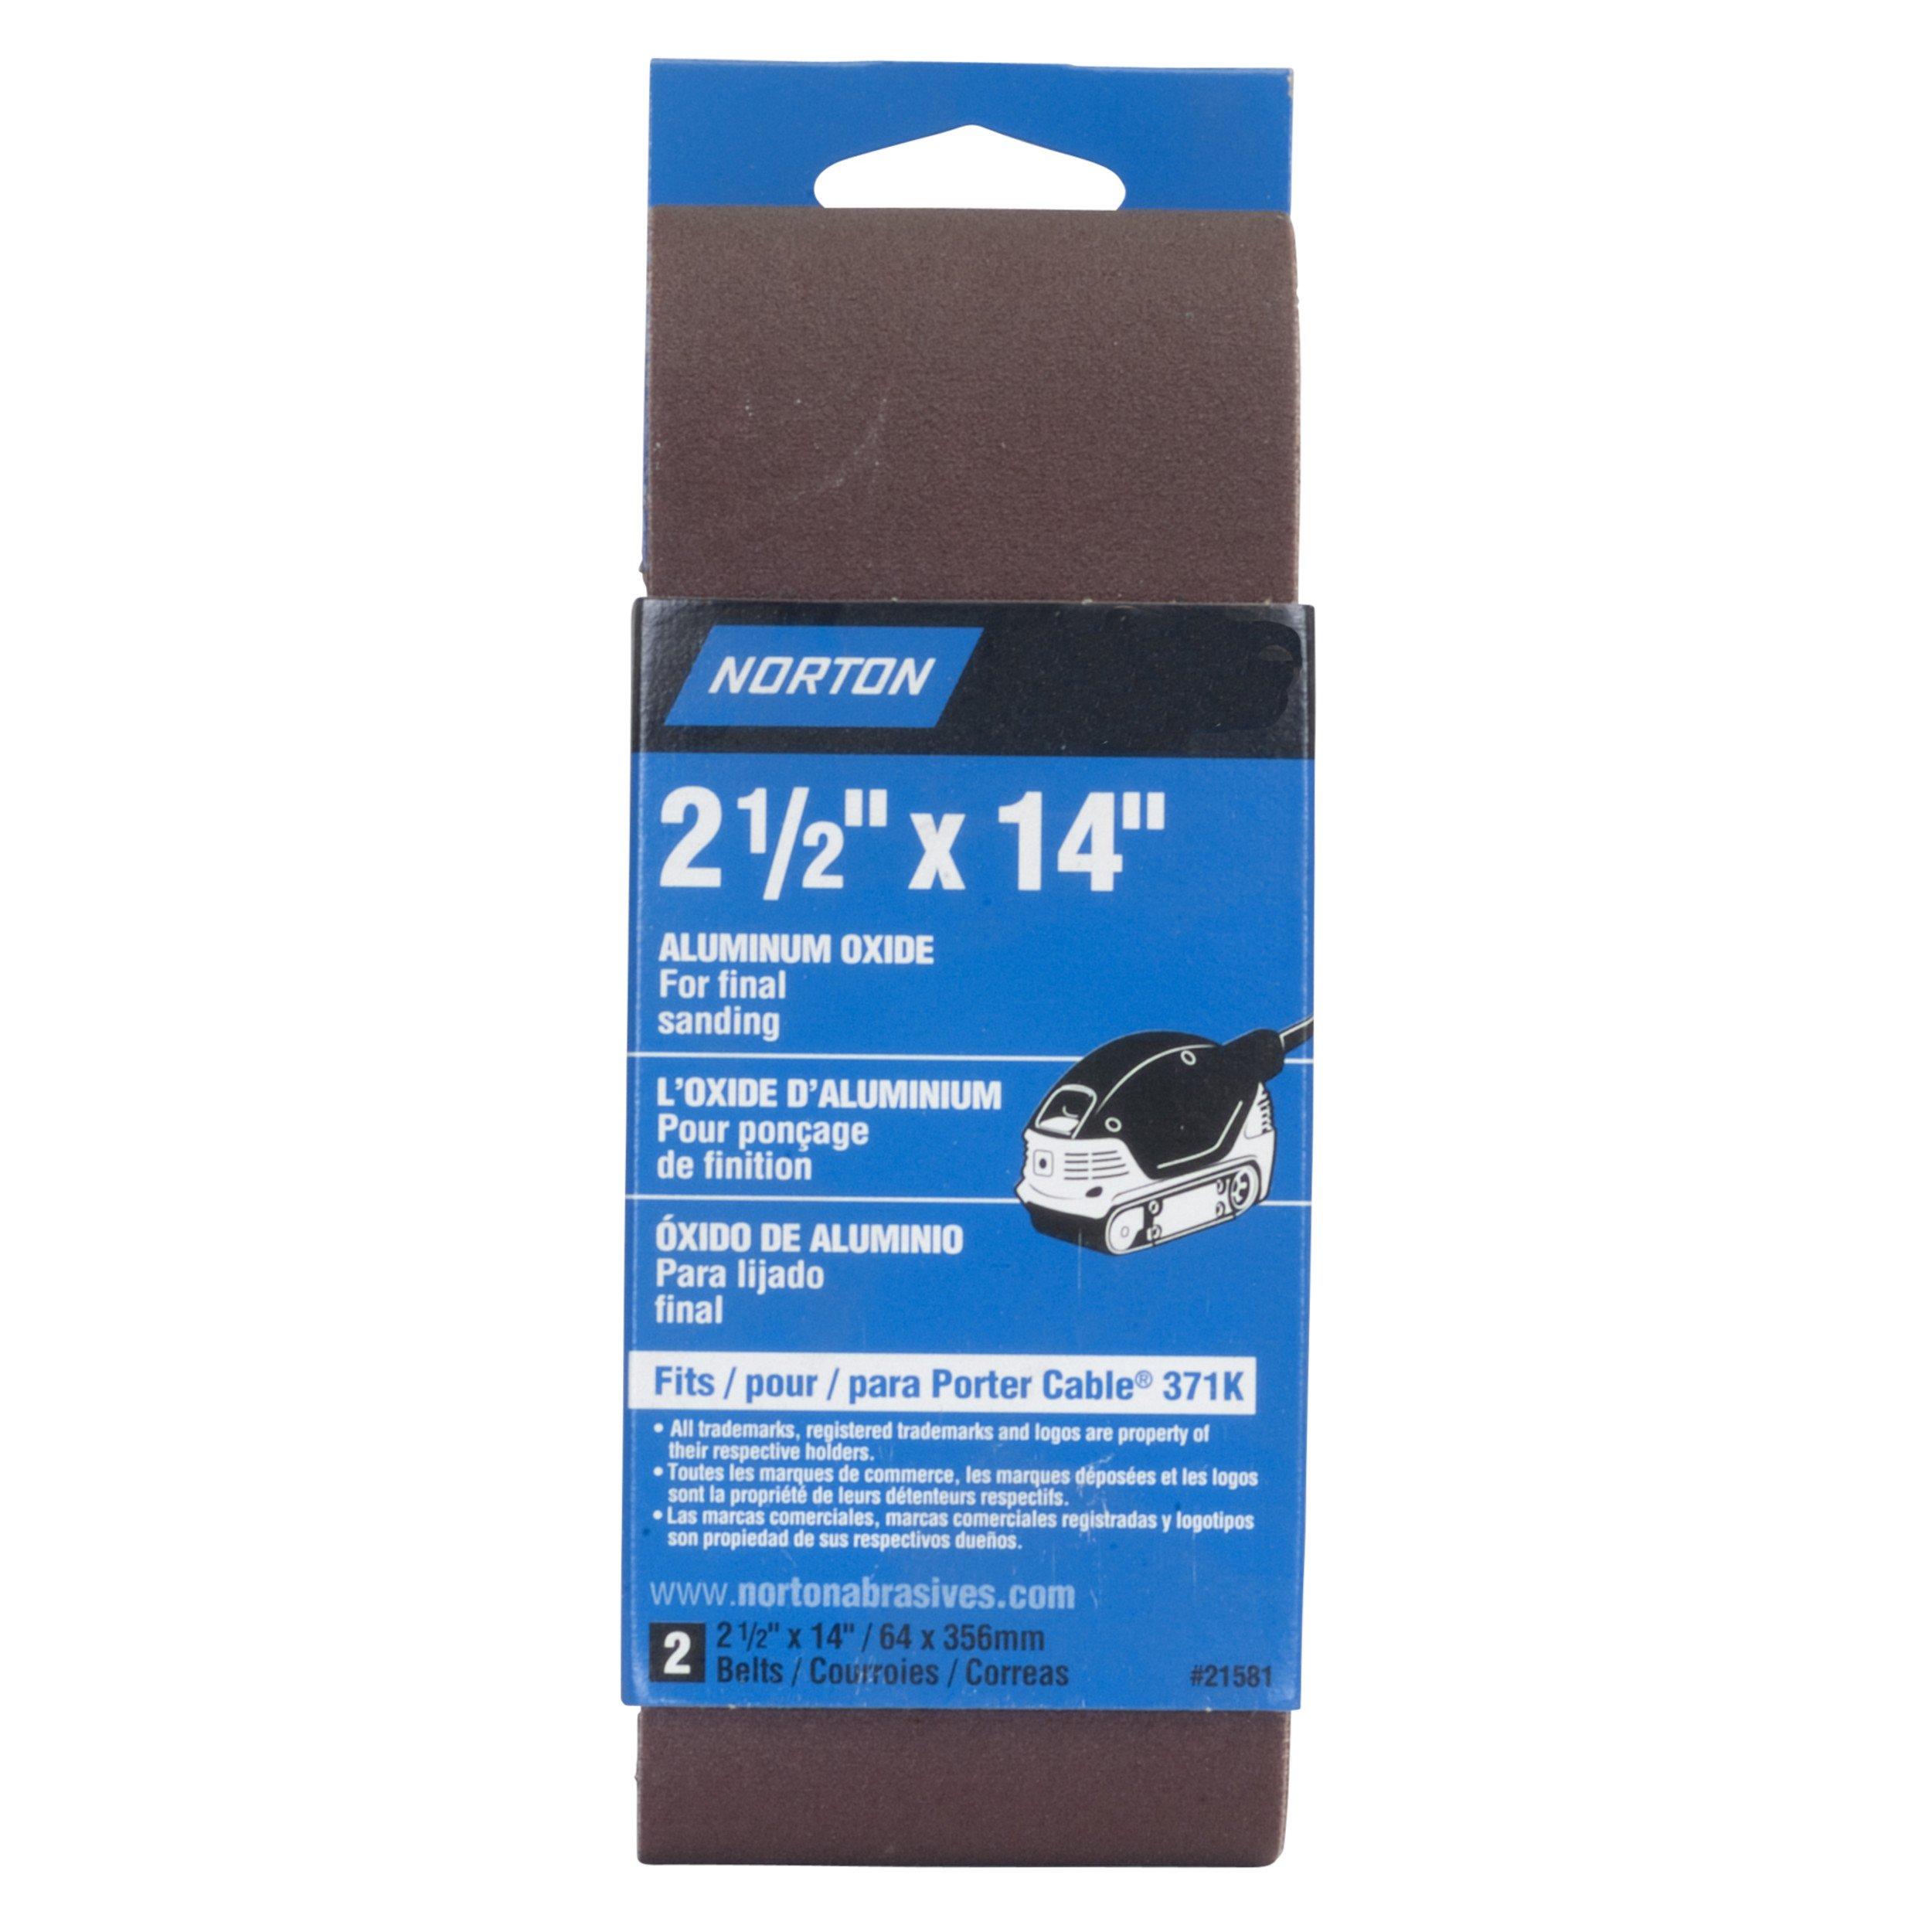 Norton 3'' x 18'' Aluminum Oxide Sanding Belt, 120 Grit, 2 pack